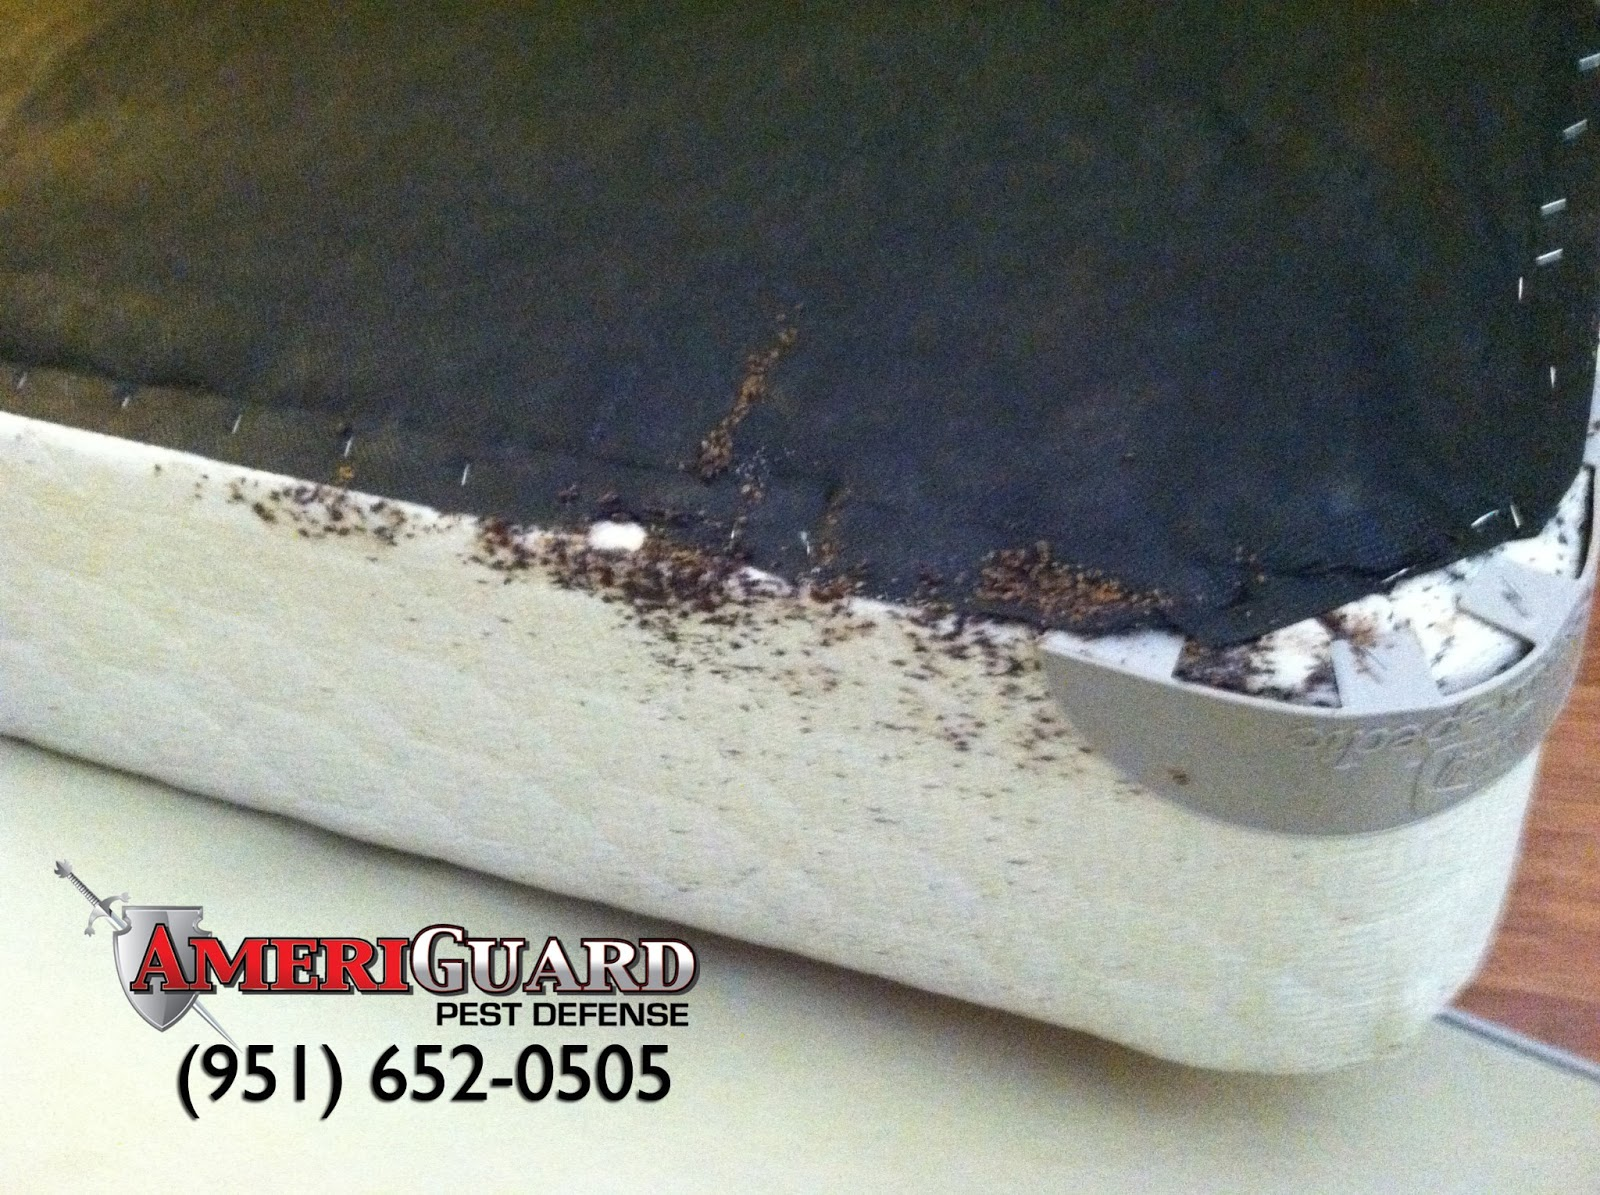 Pest Termite Gopher control in Temecula Murrieta Hemet